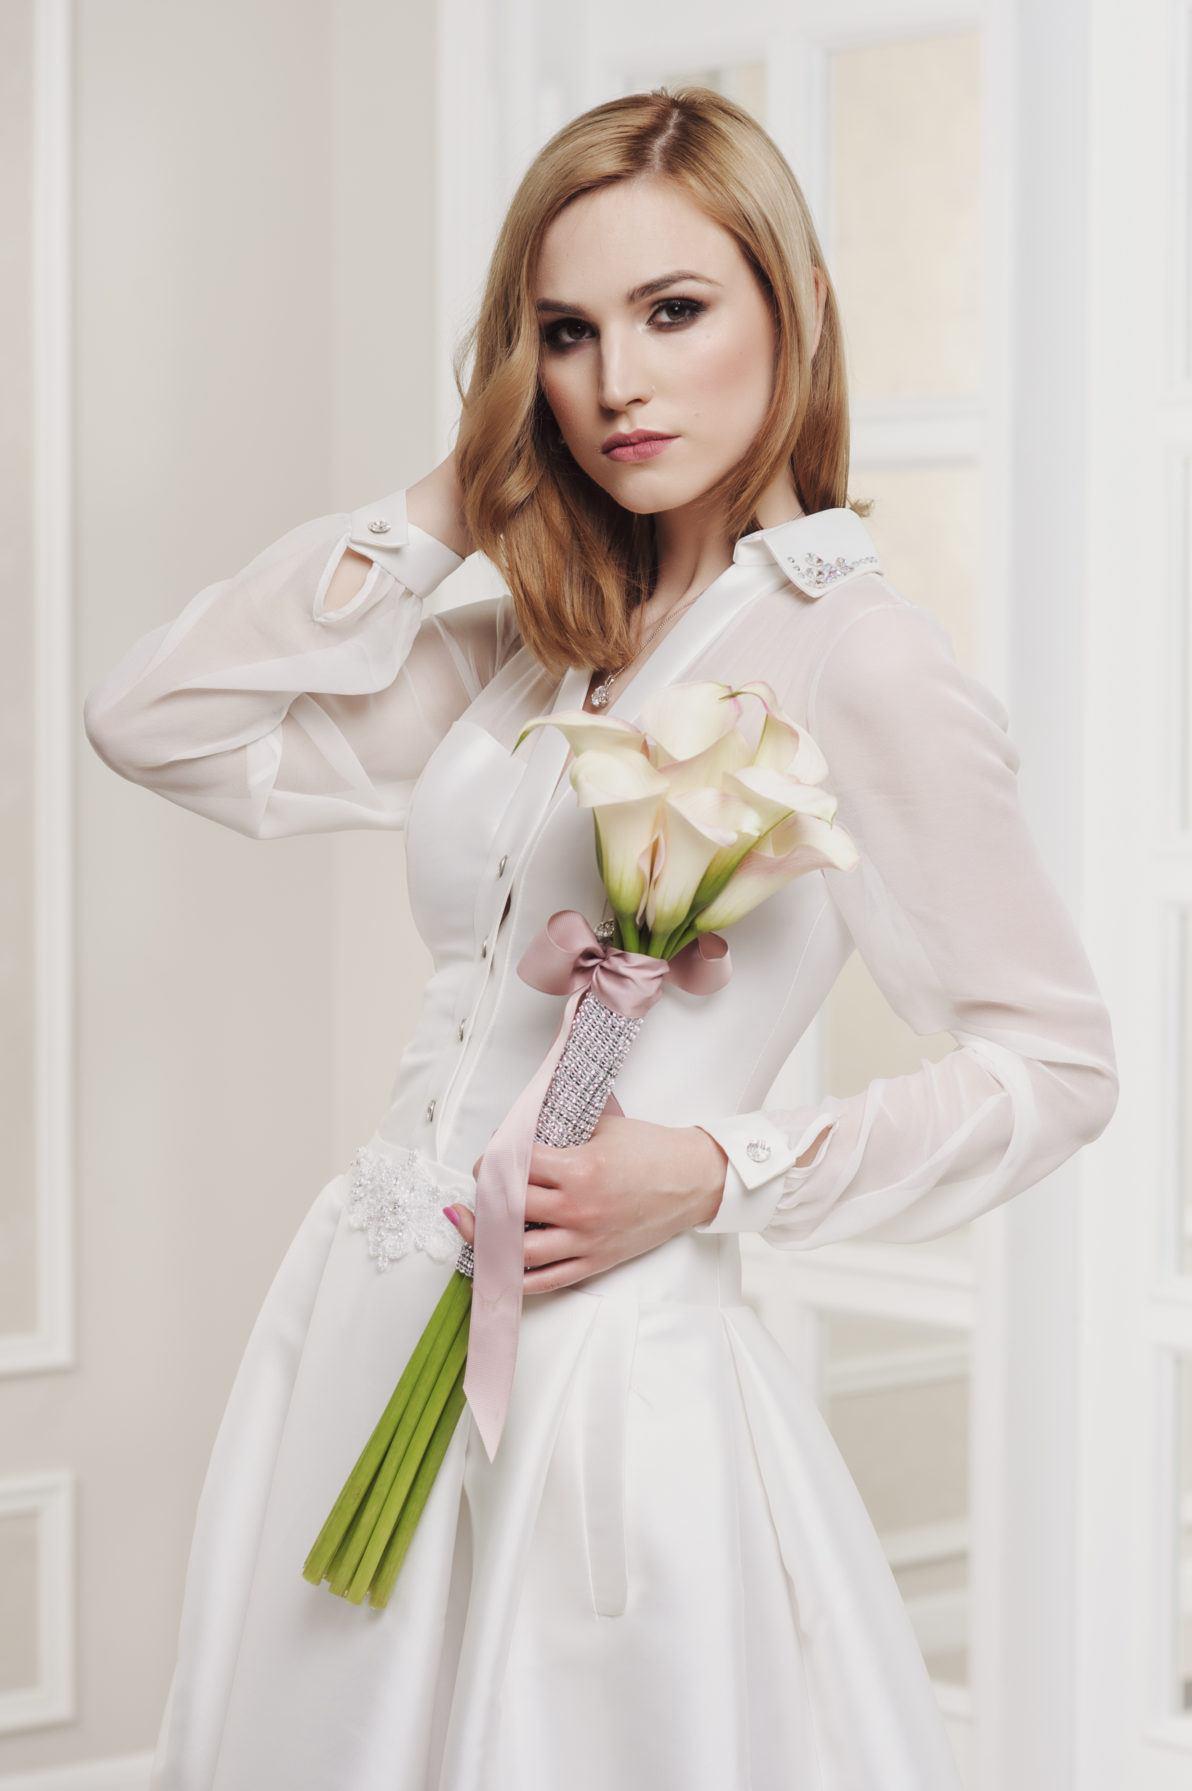 suknia ślubna rozpinana z przodu